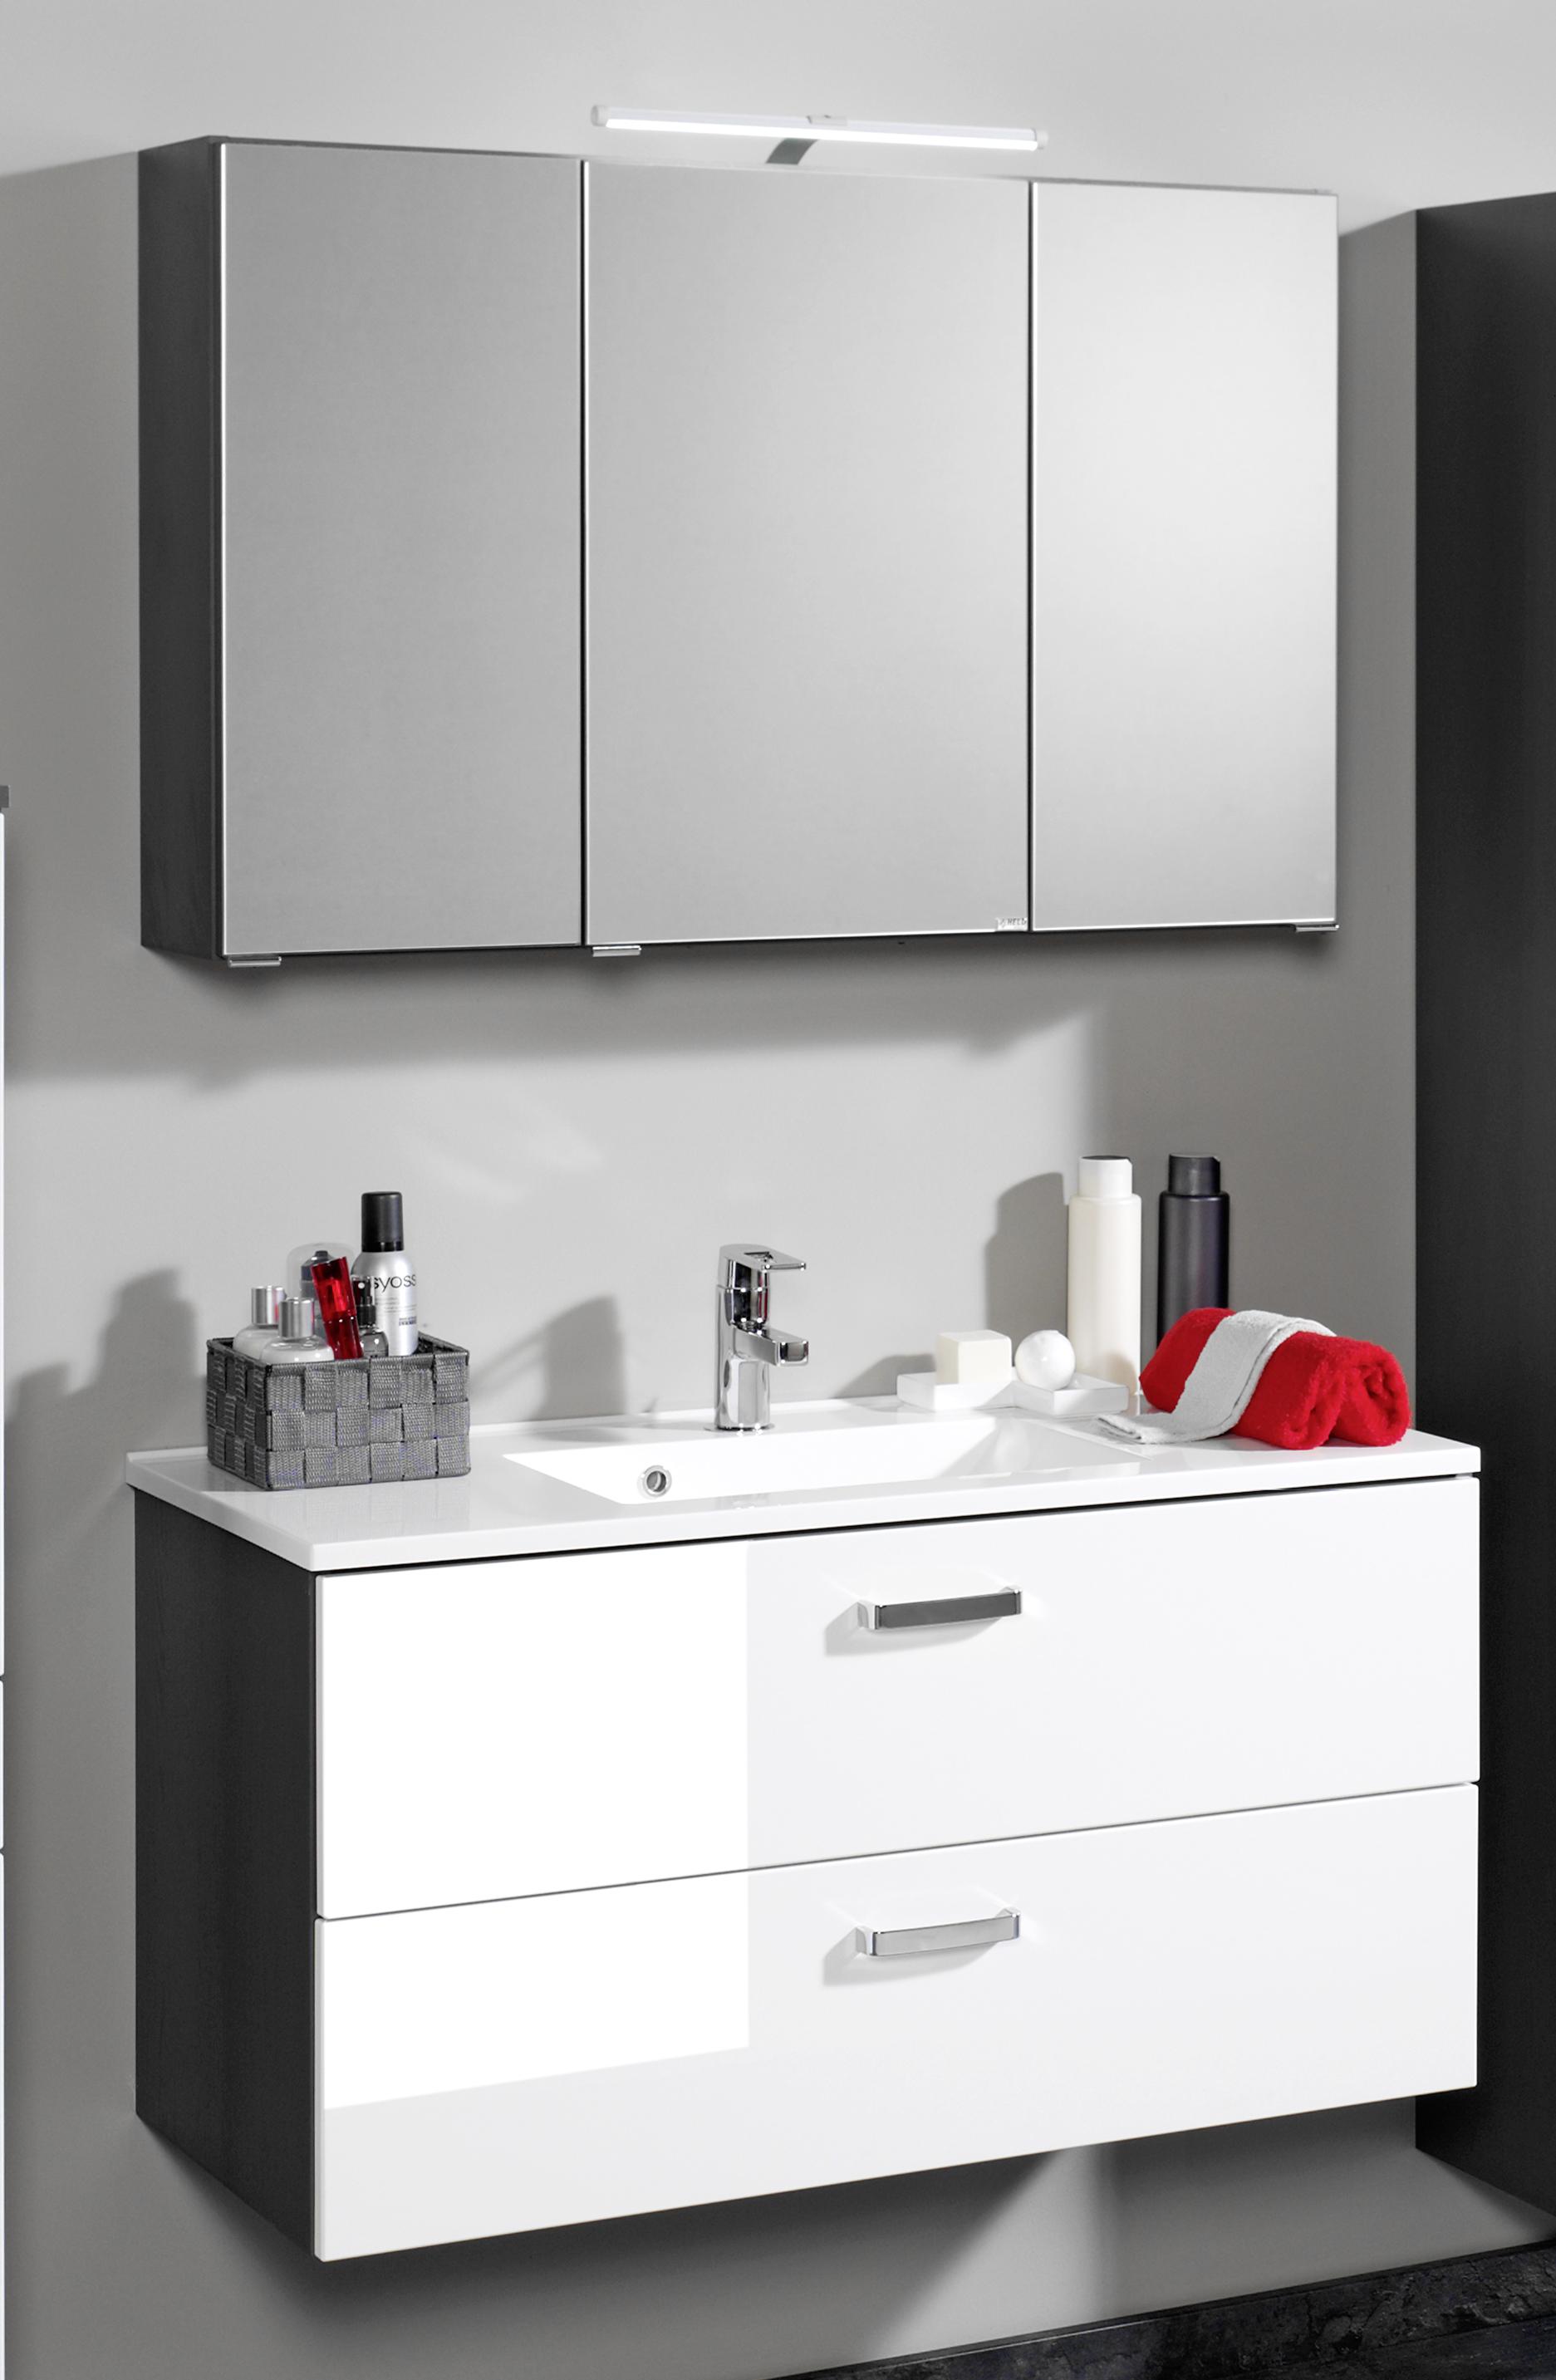 held m bel bologna waschtisch spiegel set badschrank schrank badezimmerschrank ebay. Black Bedroom Furniture Sets. Home Design Ideas